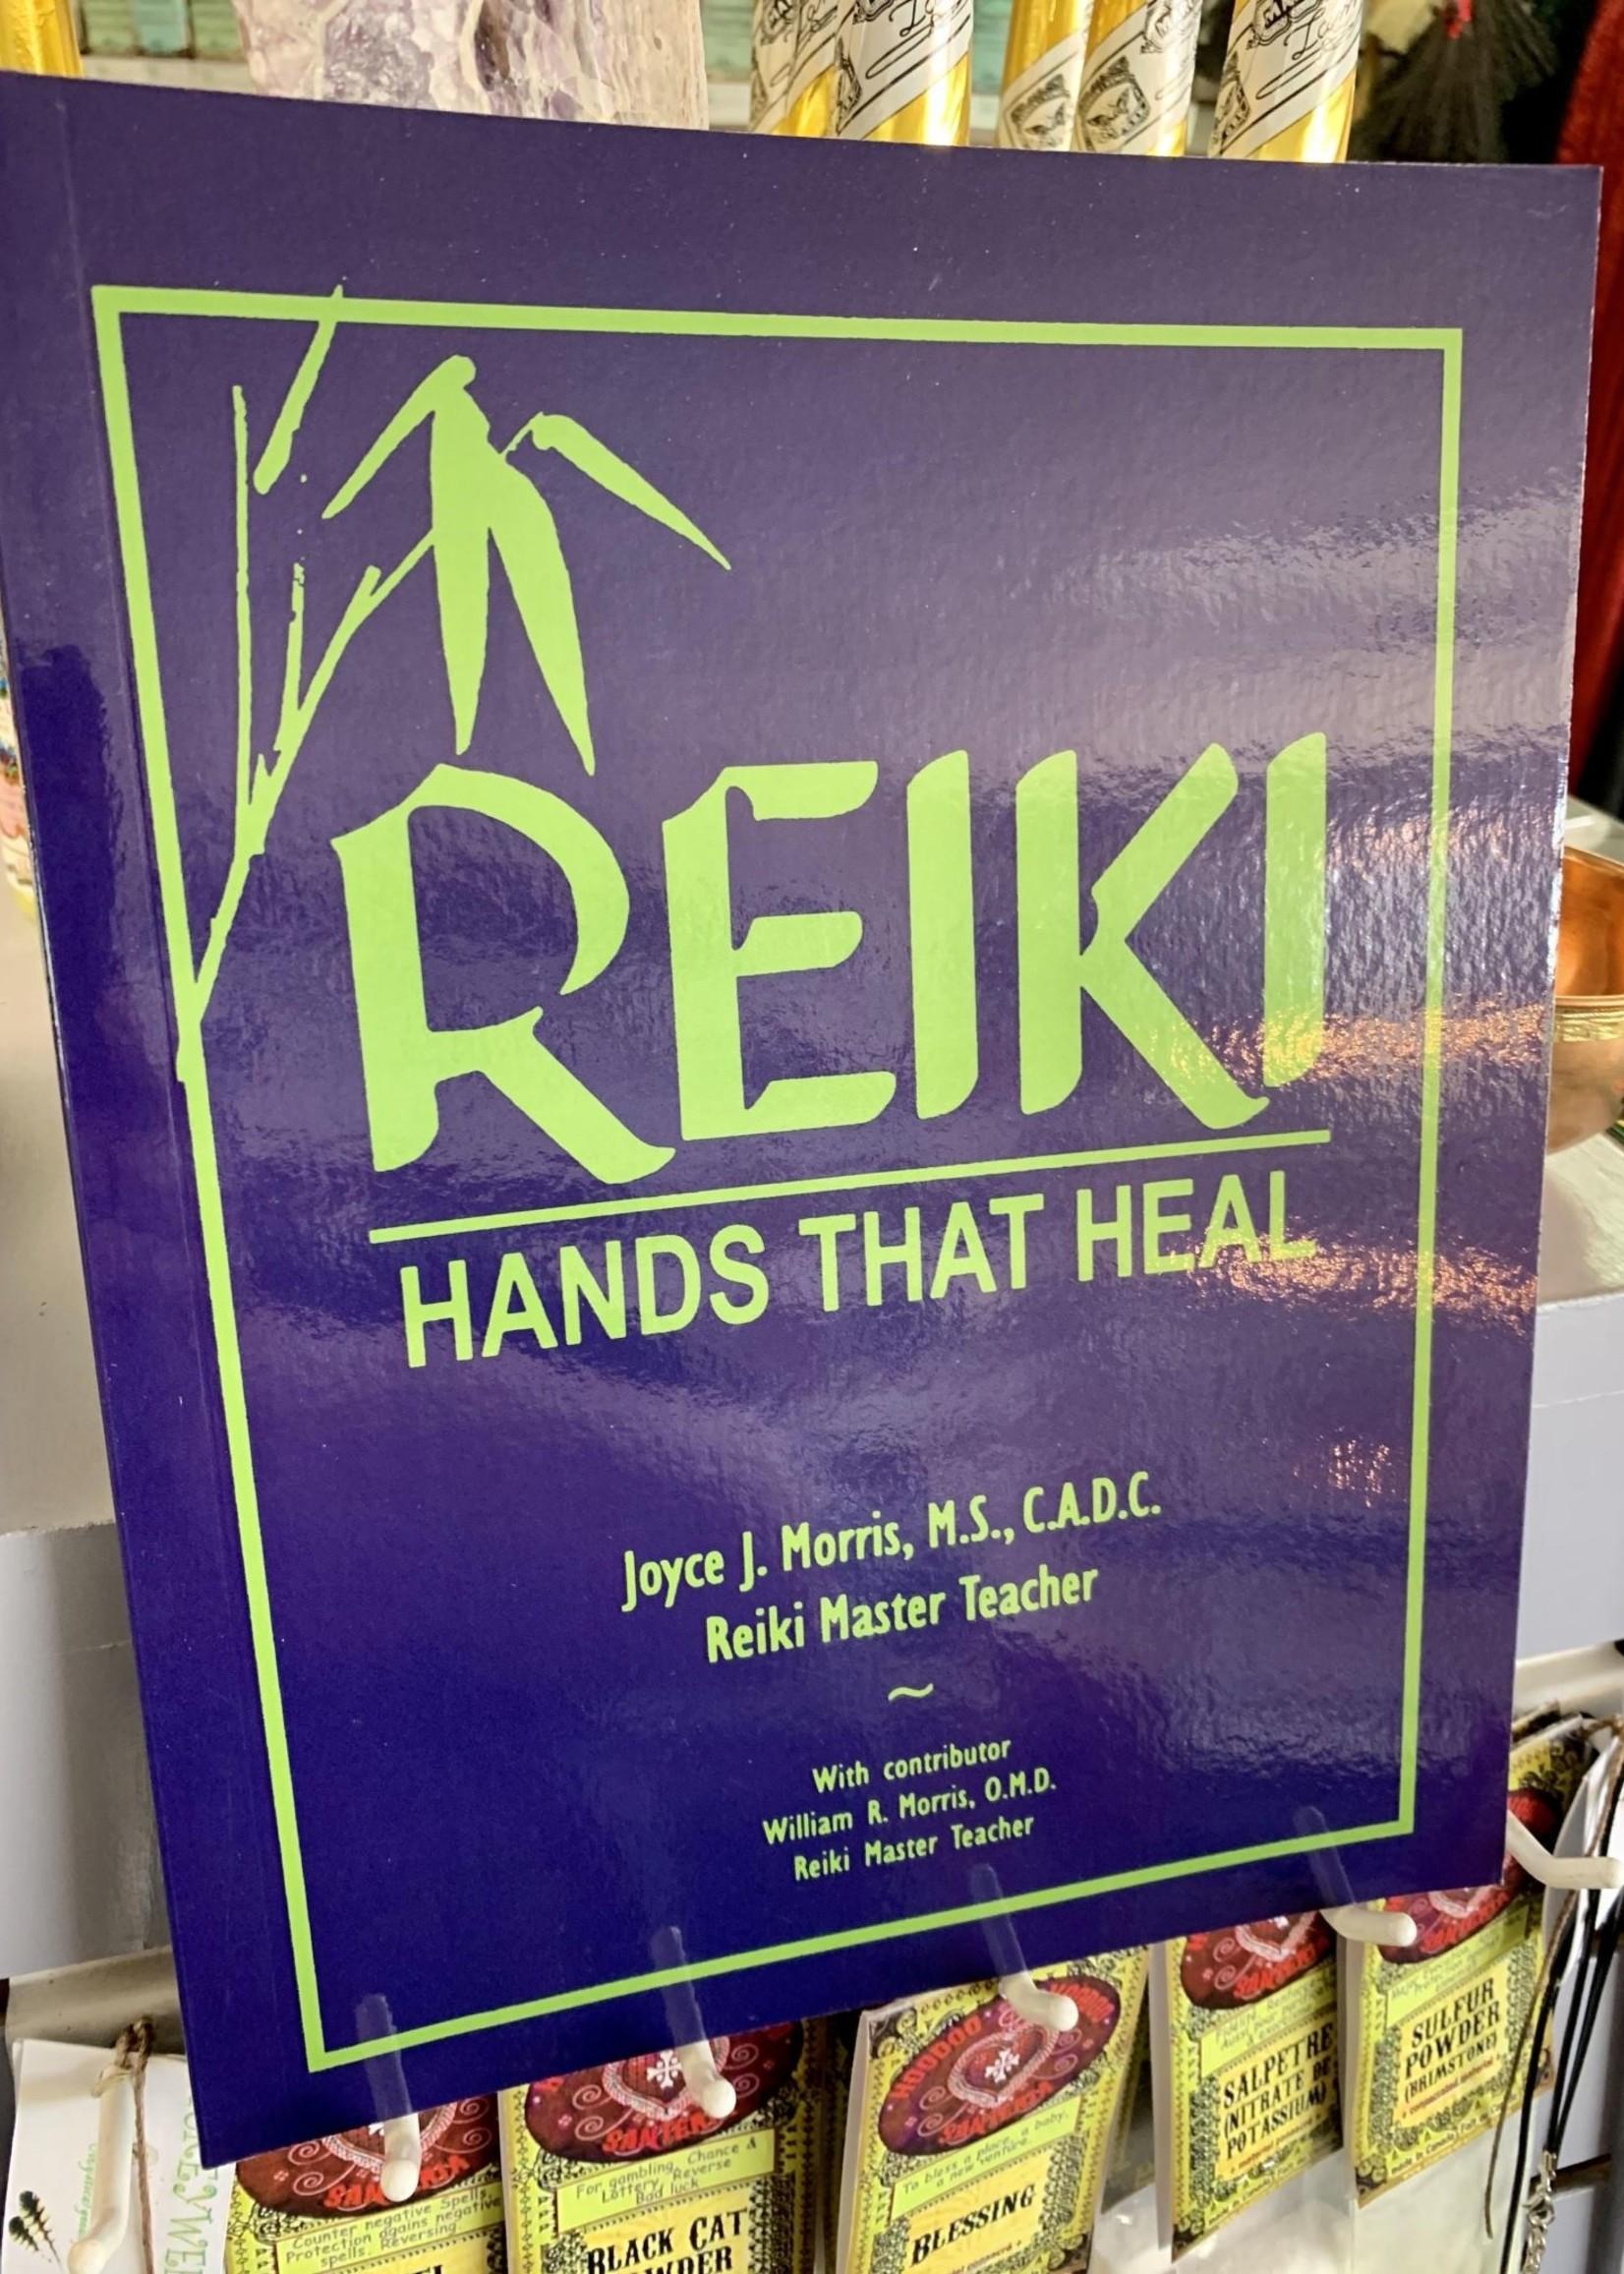 Reiki - Hands that Heal - Joyce J. Morris M.S., C.A.D.C.